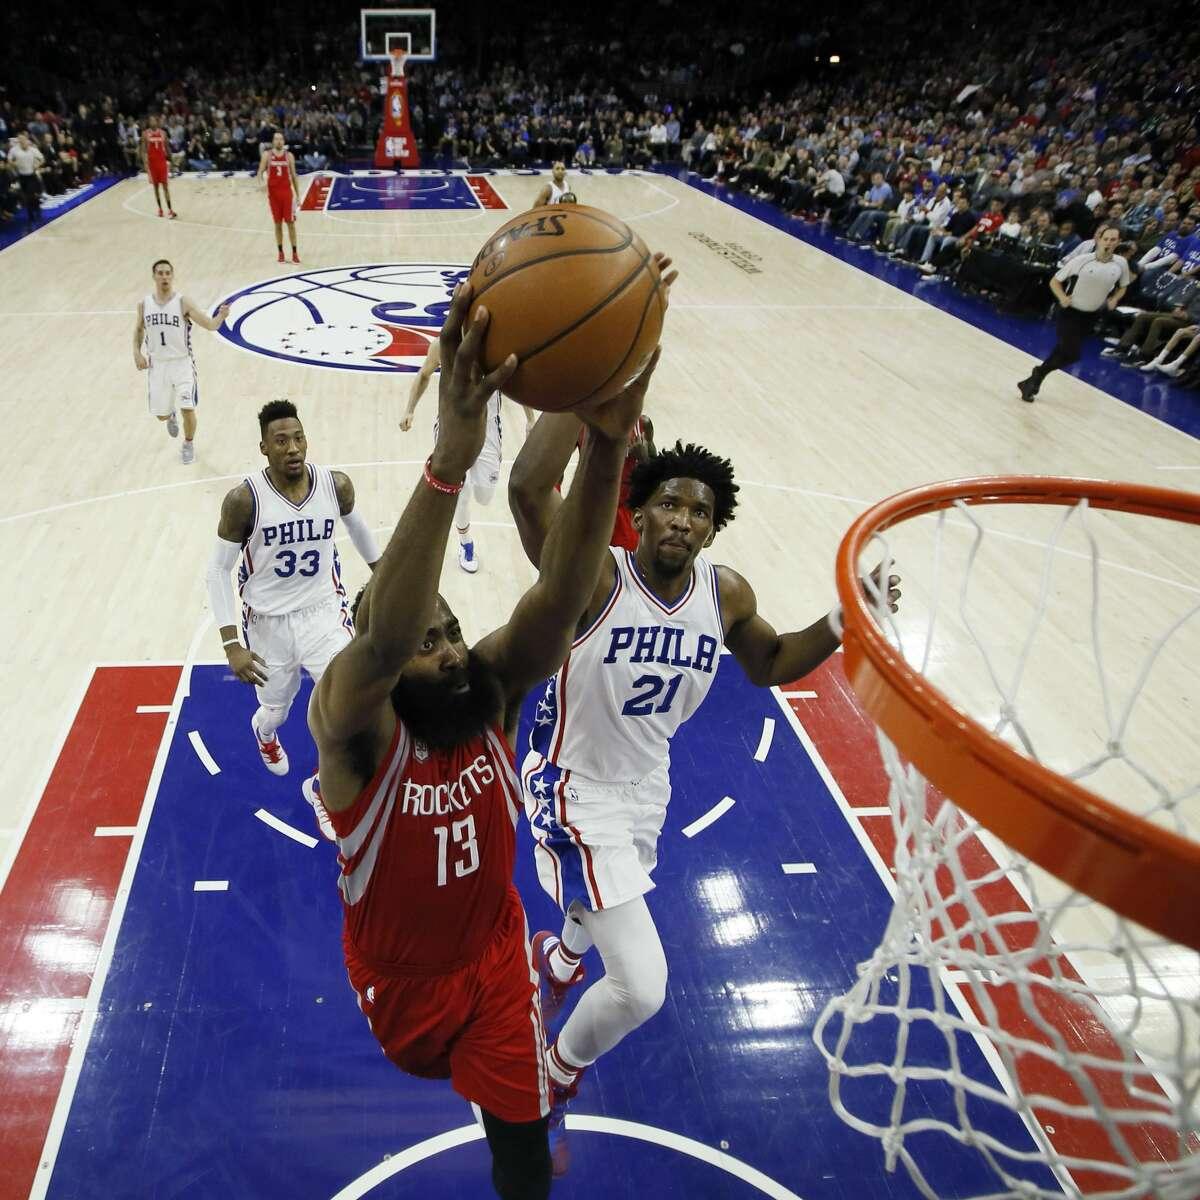 Houston Rockets' James Harden (13) goes up for a dunk against Philadelphia 76ers' Joel Embiid (21) during the second half of an NBA basketball game, Friday, Jan. 27, 2017, in Philadelphia. Houston won 123-118. (AP Photo/Matt Slocum)